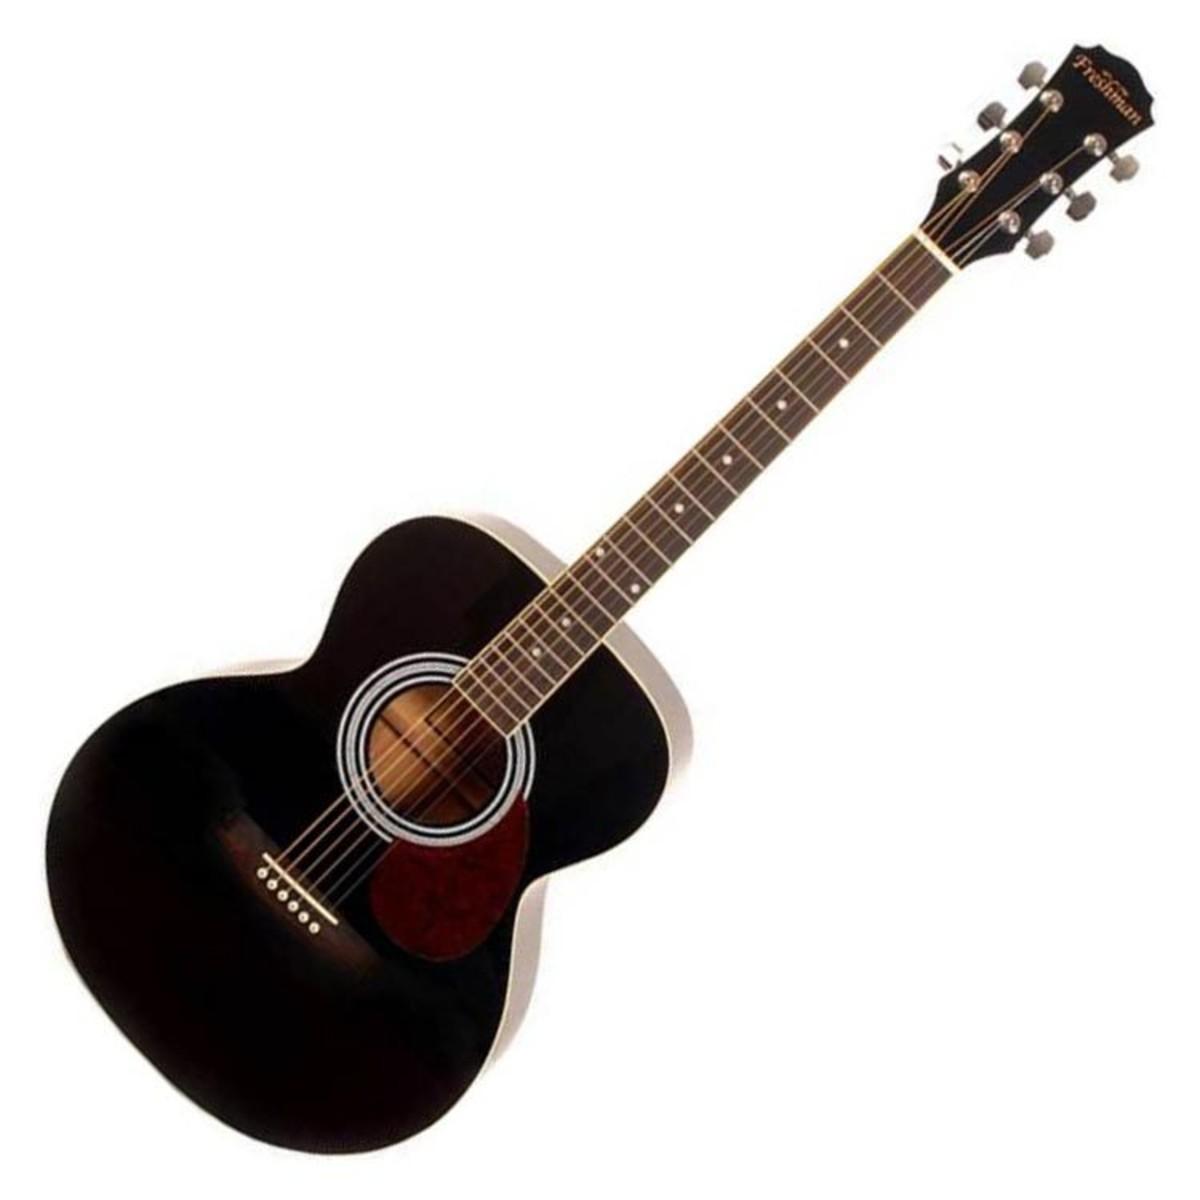 freshman renfbk folk guitare acoustique noir de corps. Black Bedroom Furniture Sets. Home Design Ideas